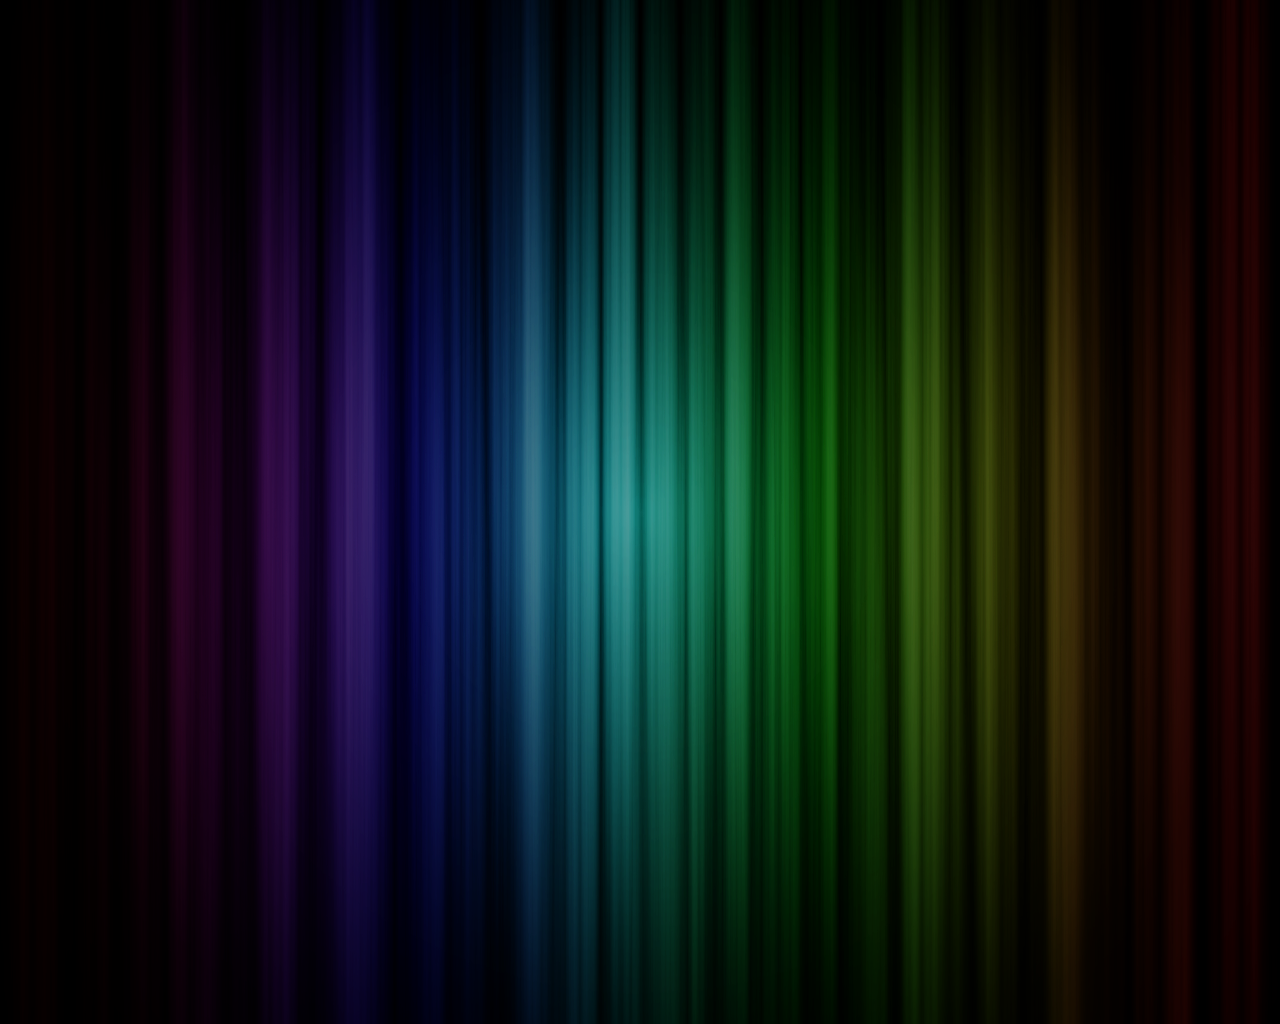 colorful wallpaper 1898